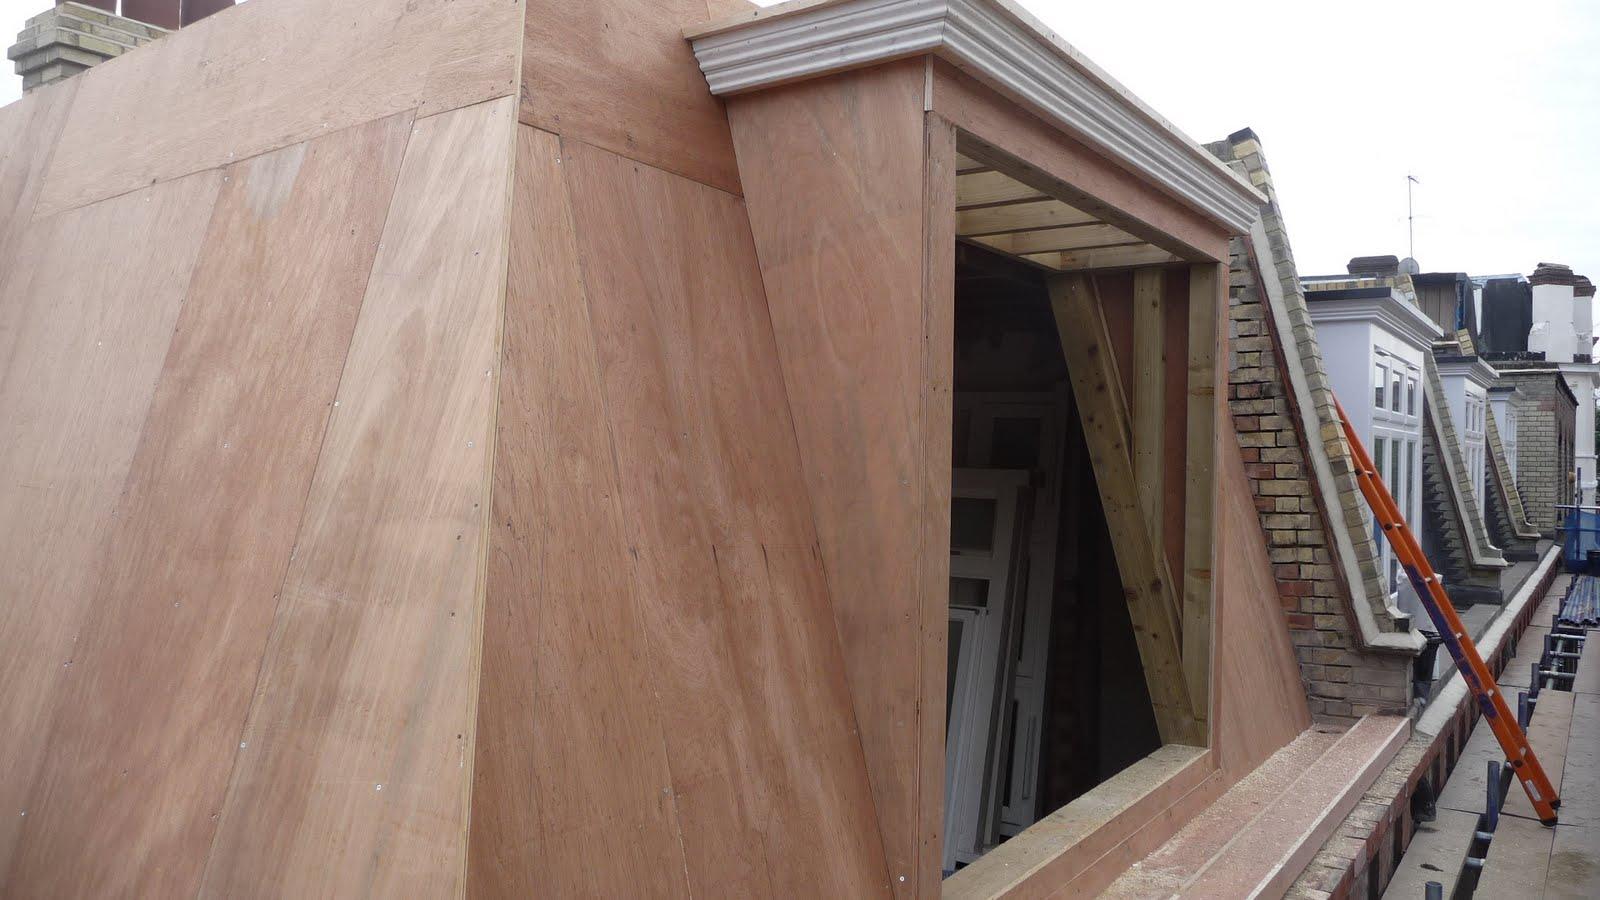 Woodenbother Mansard Roof Construction